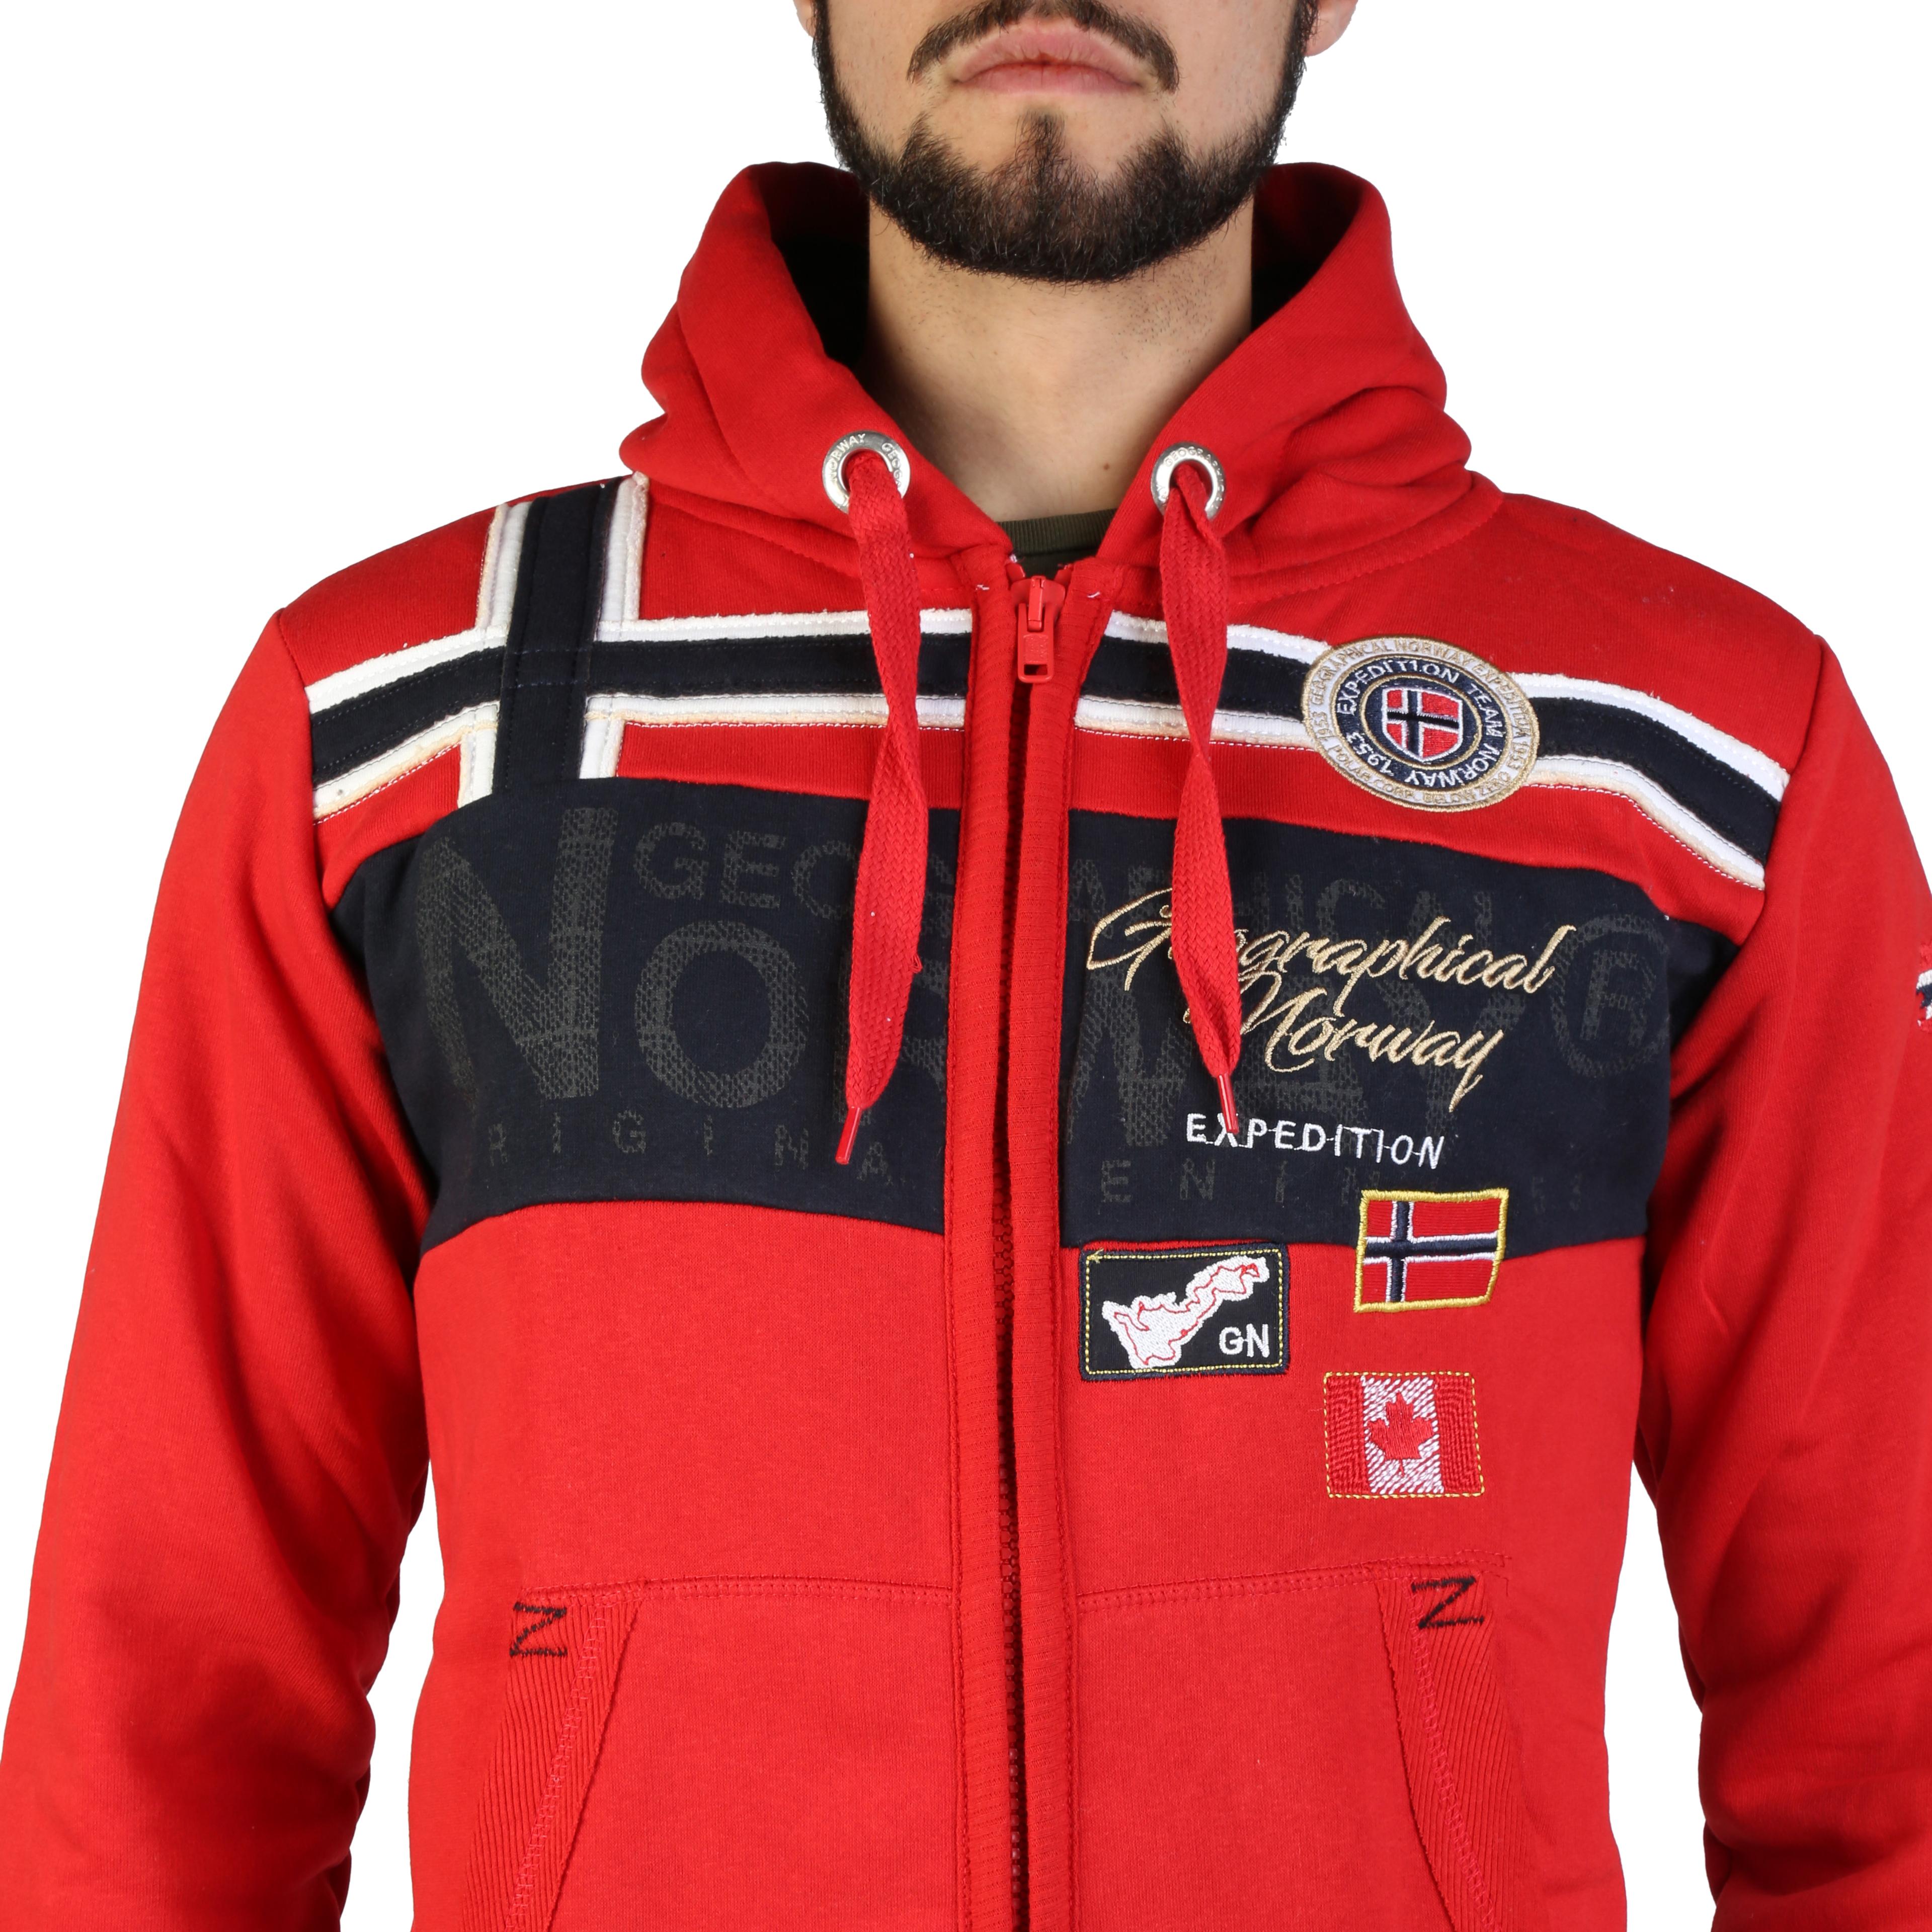 Felpe-Geographical-Norway-Garadock-man-Uomo-Rosso-97311 miniatura 3